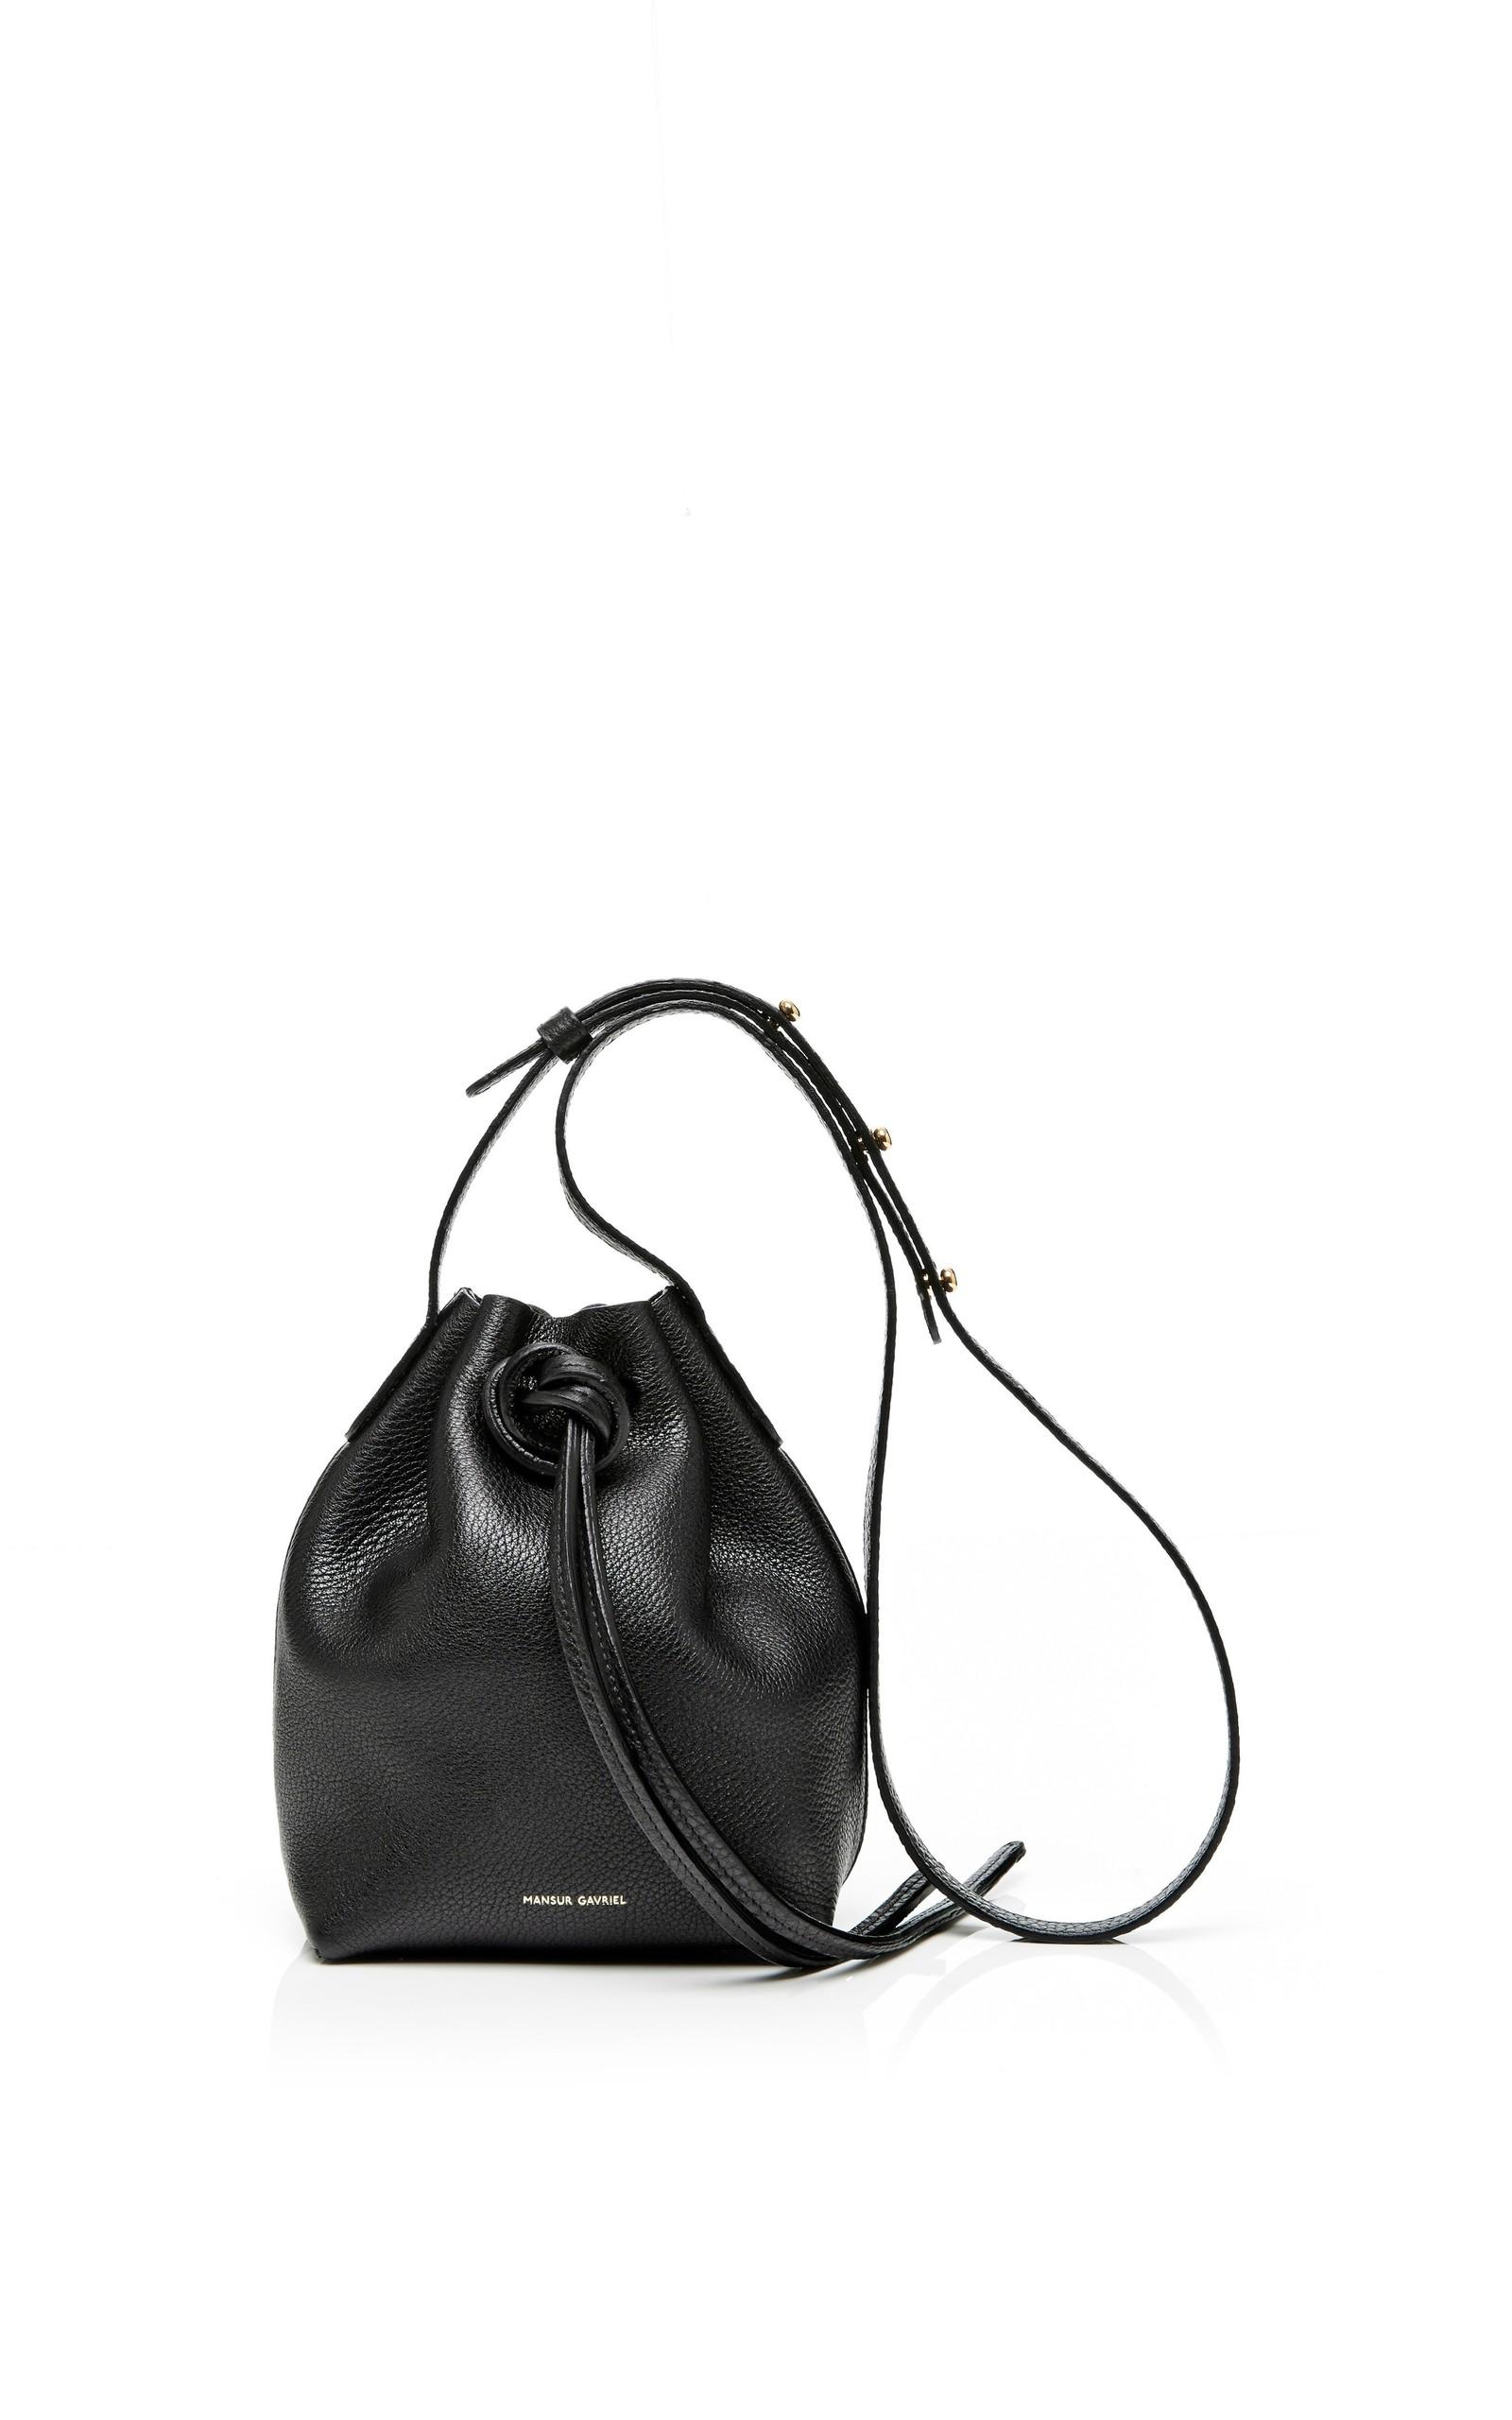 fb84d7b50dc0 Tumble Leather Mini Mini Bag In Black by Mansur Gavriel